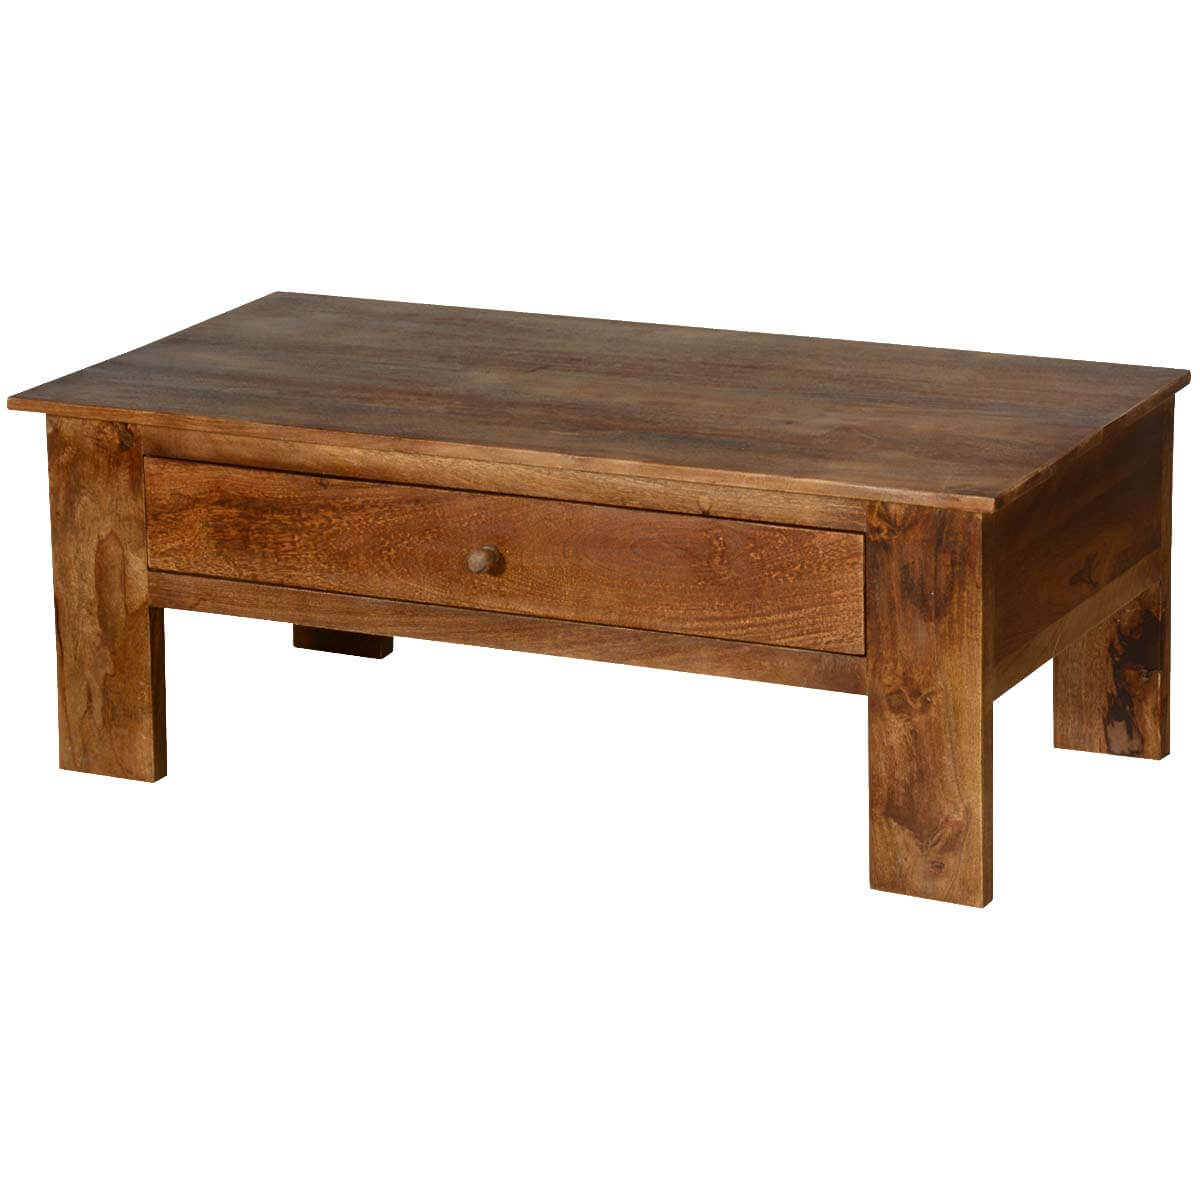 "Rustic All Wood Coffee Table: Pioneer Rustic Solid Mango Wood 42"" Coffee Table W Hidden"